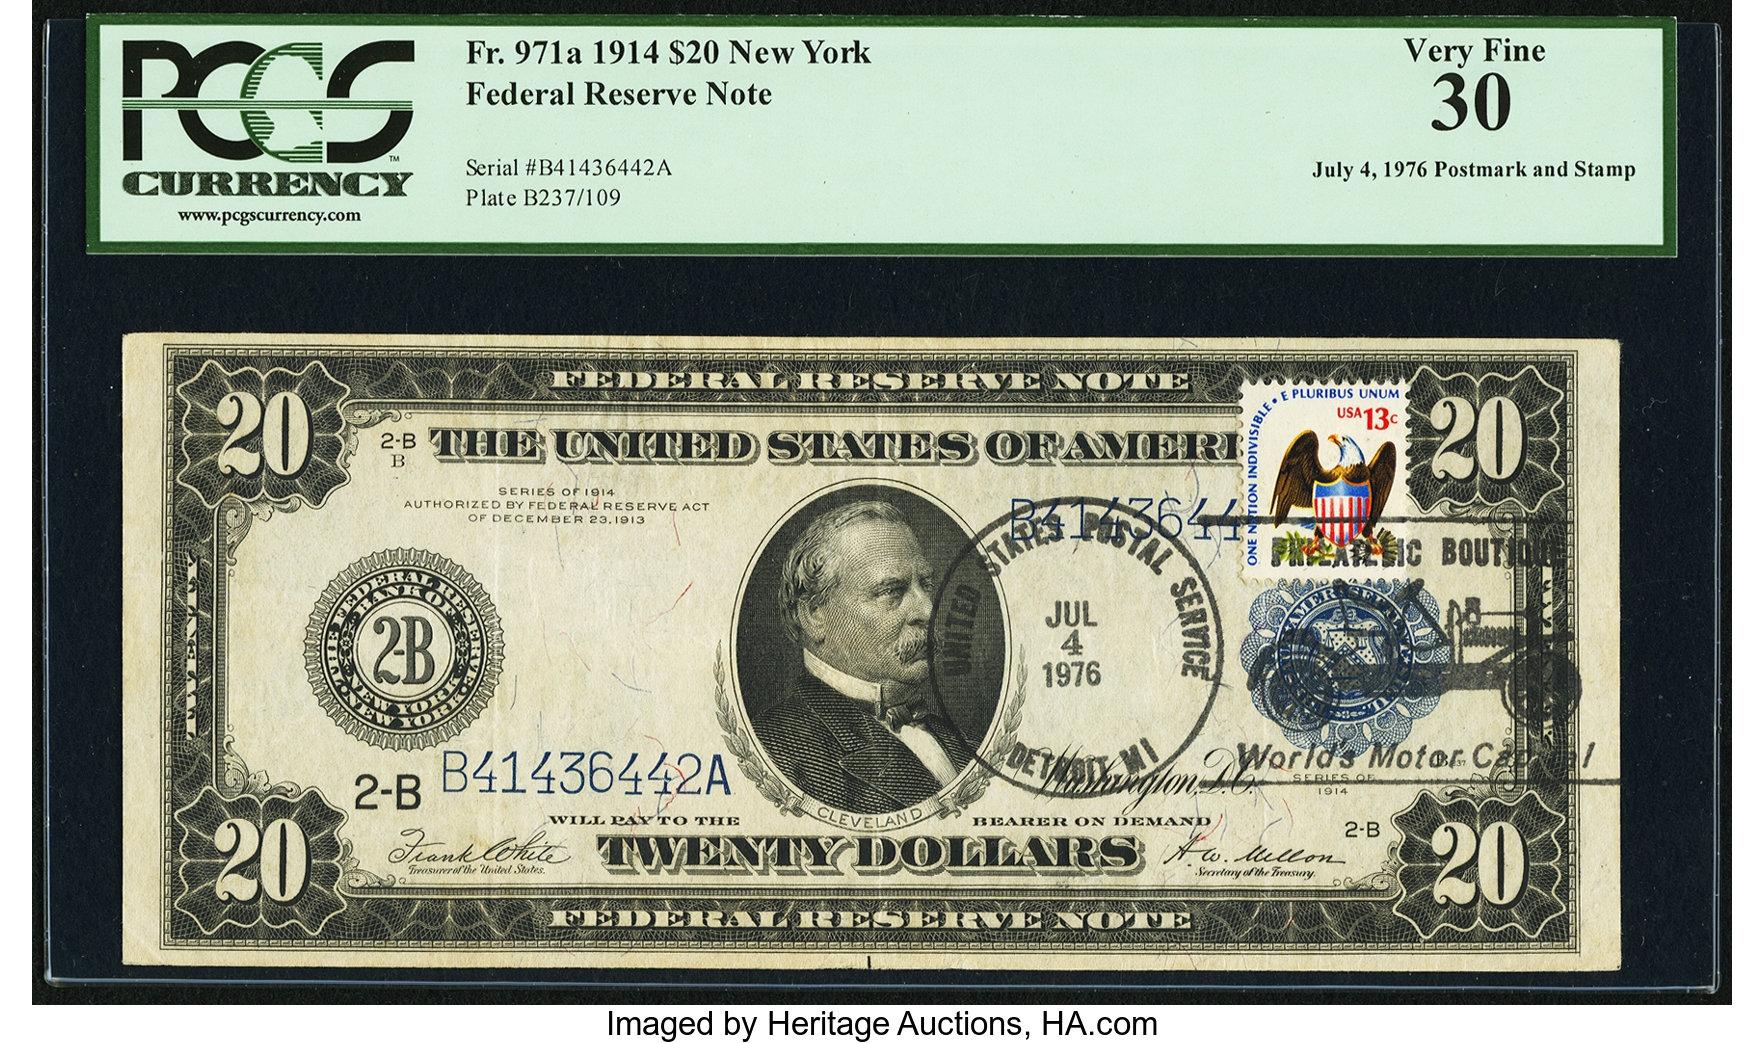 sample image for Fr.971A $20 NY